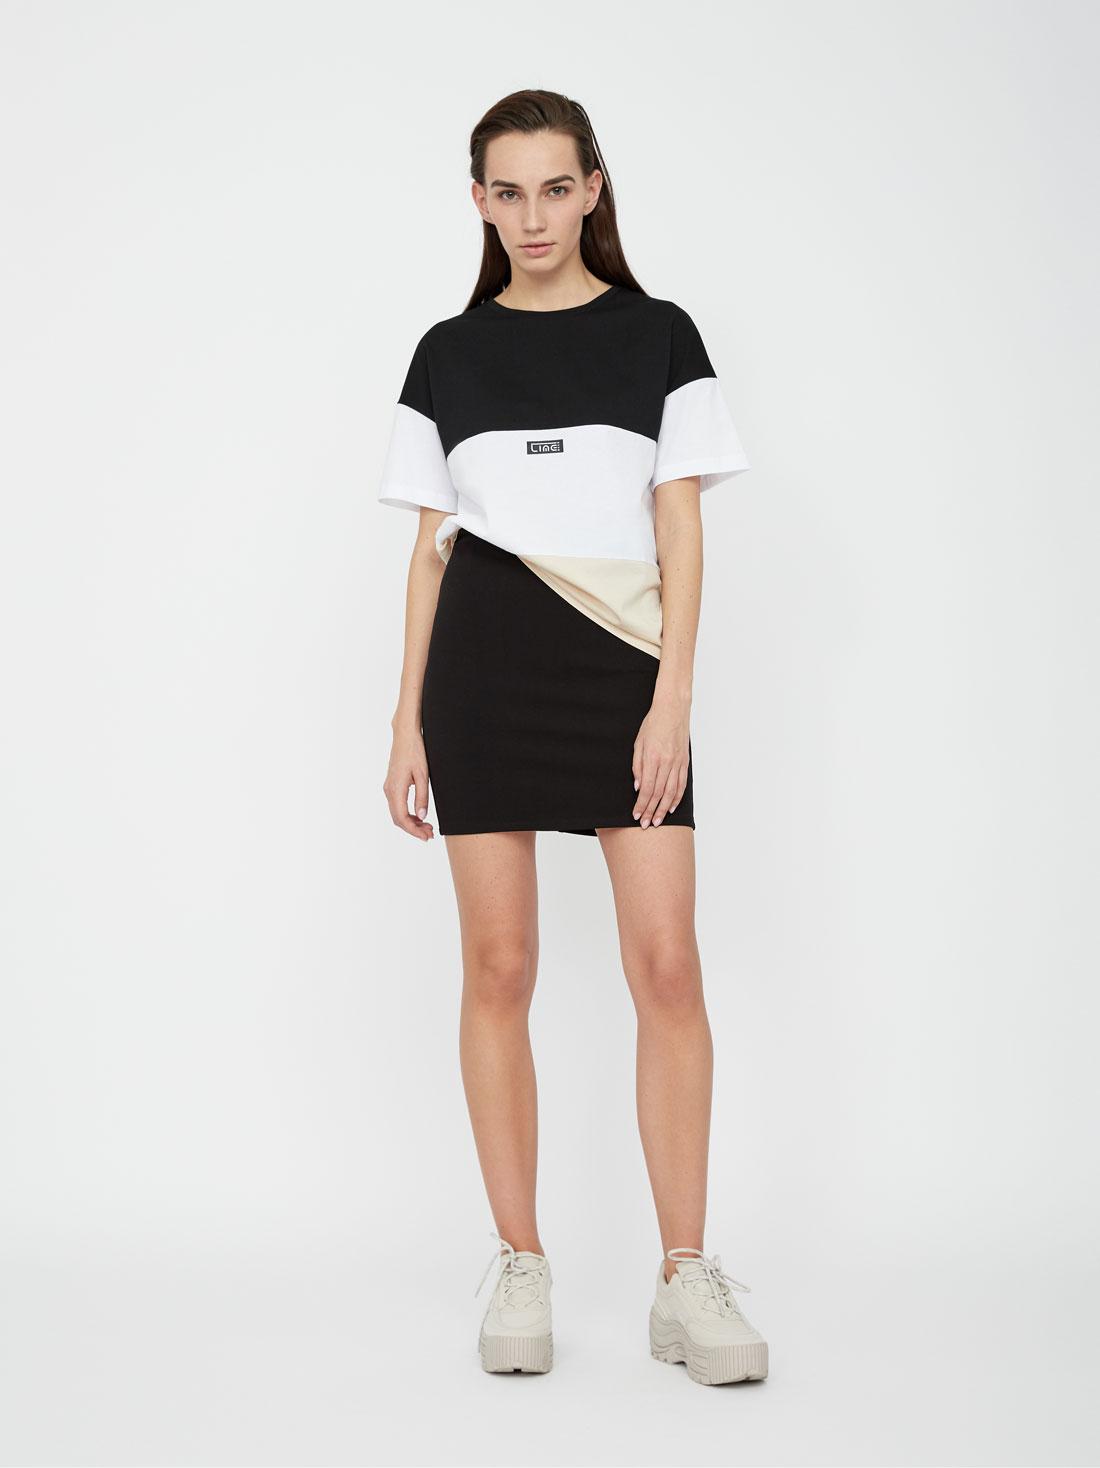 Юбка LIME Трикотажная мини-юбка юбка короткая из денима с геометрическим рисунком